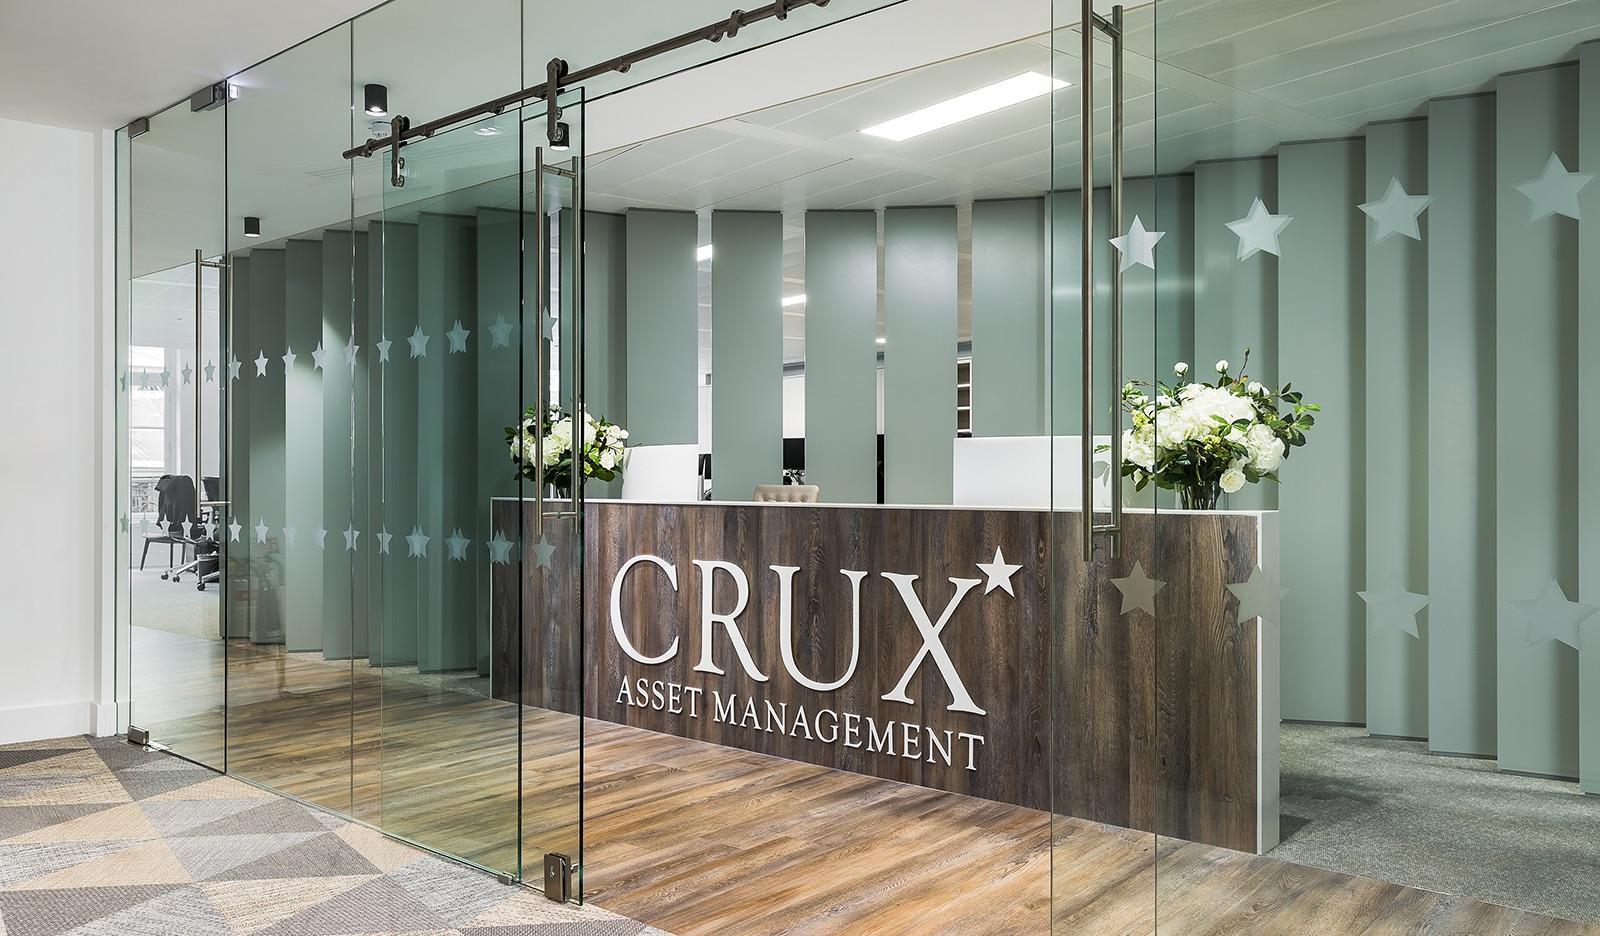 crux-office-london-1